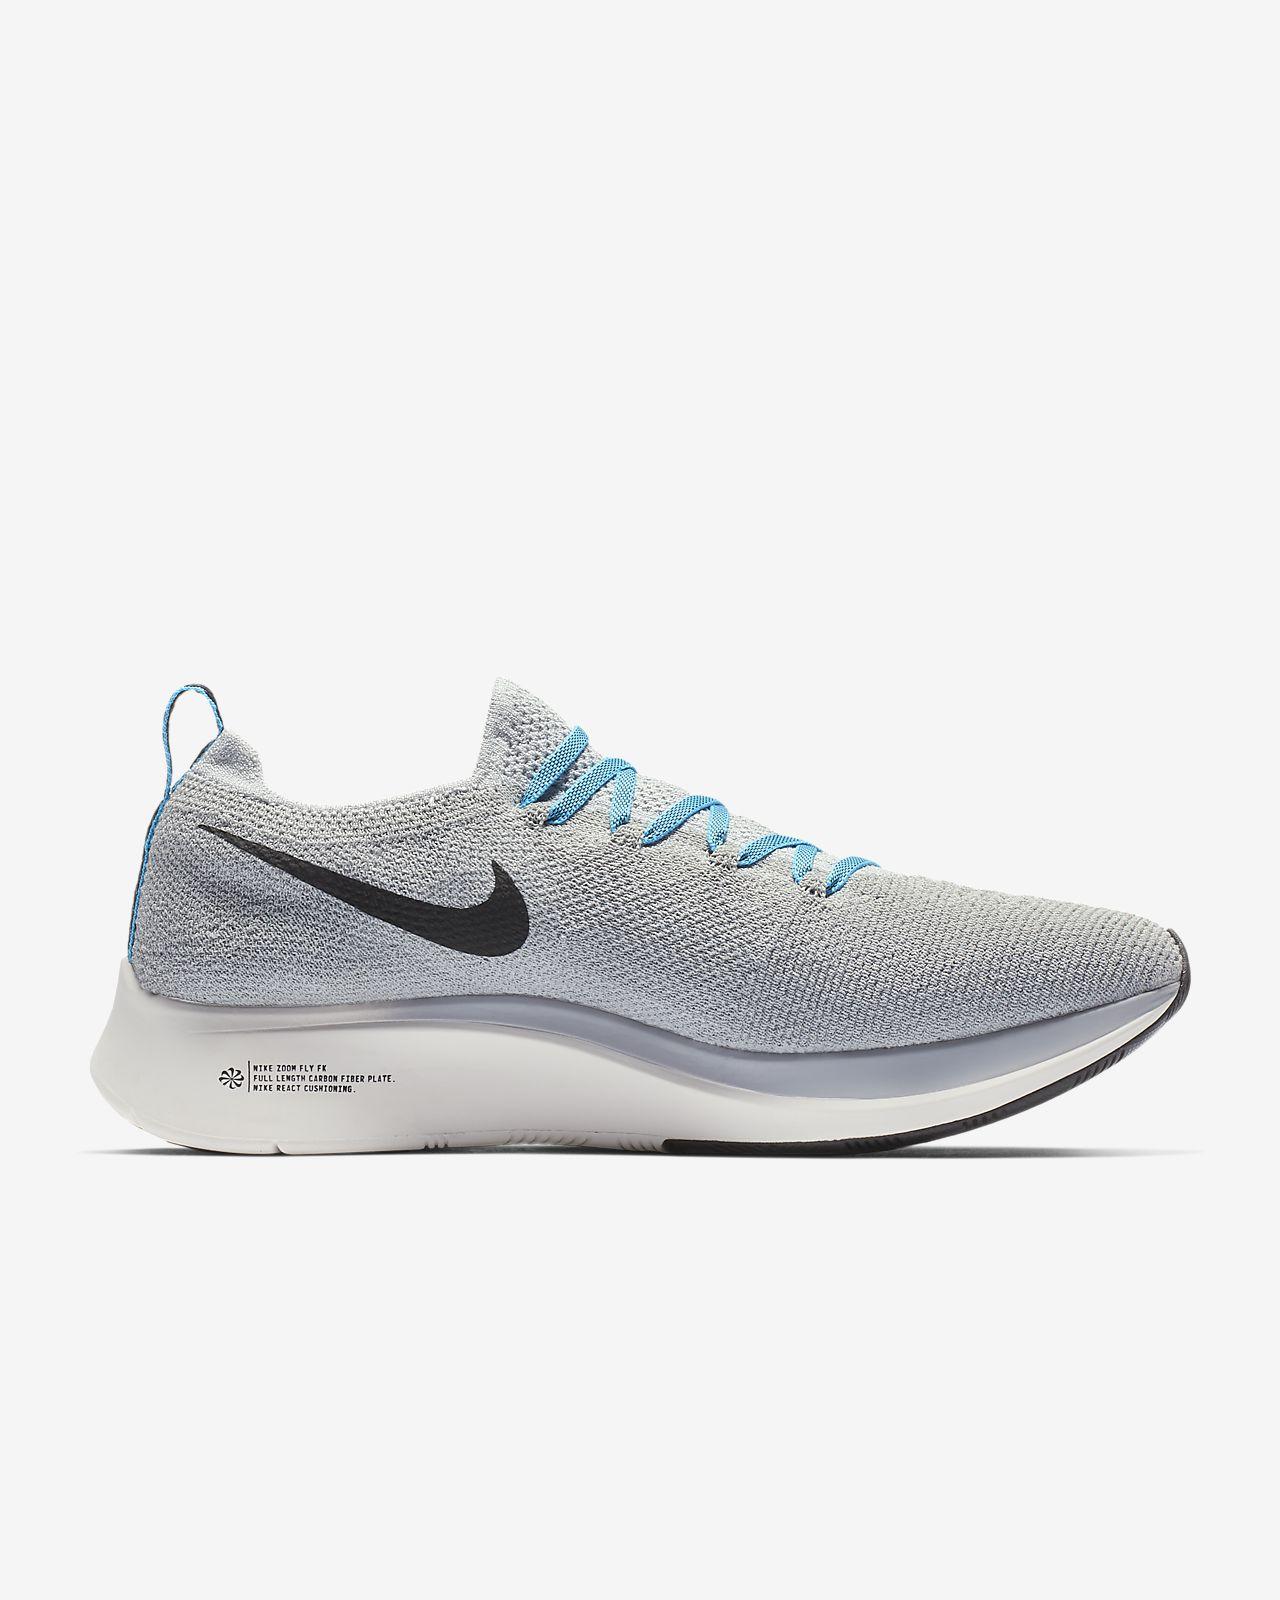 c985e187eaf9 Nike Zoom Fly Flyknit Men s Running Shoe. Nike.com